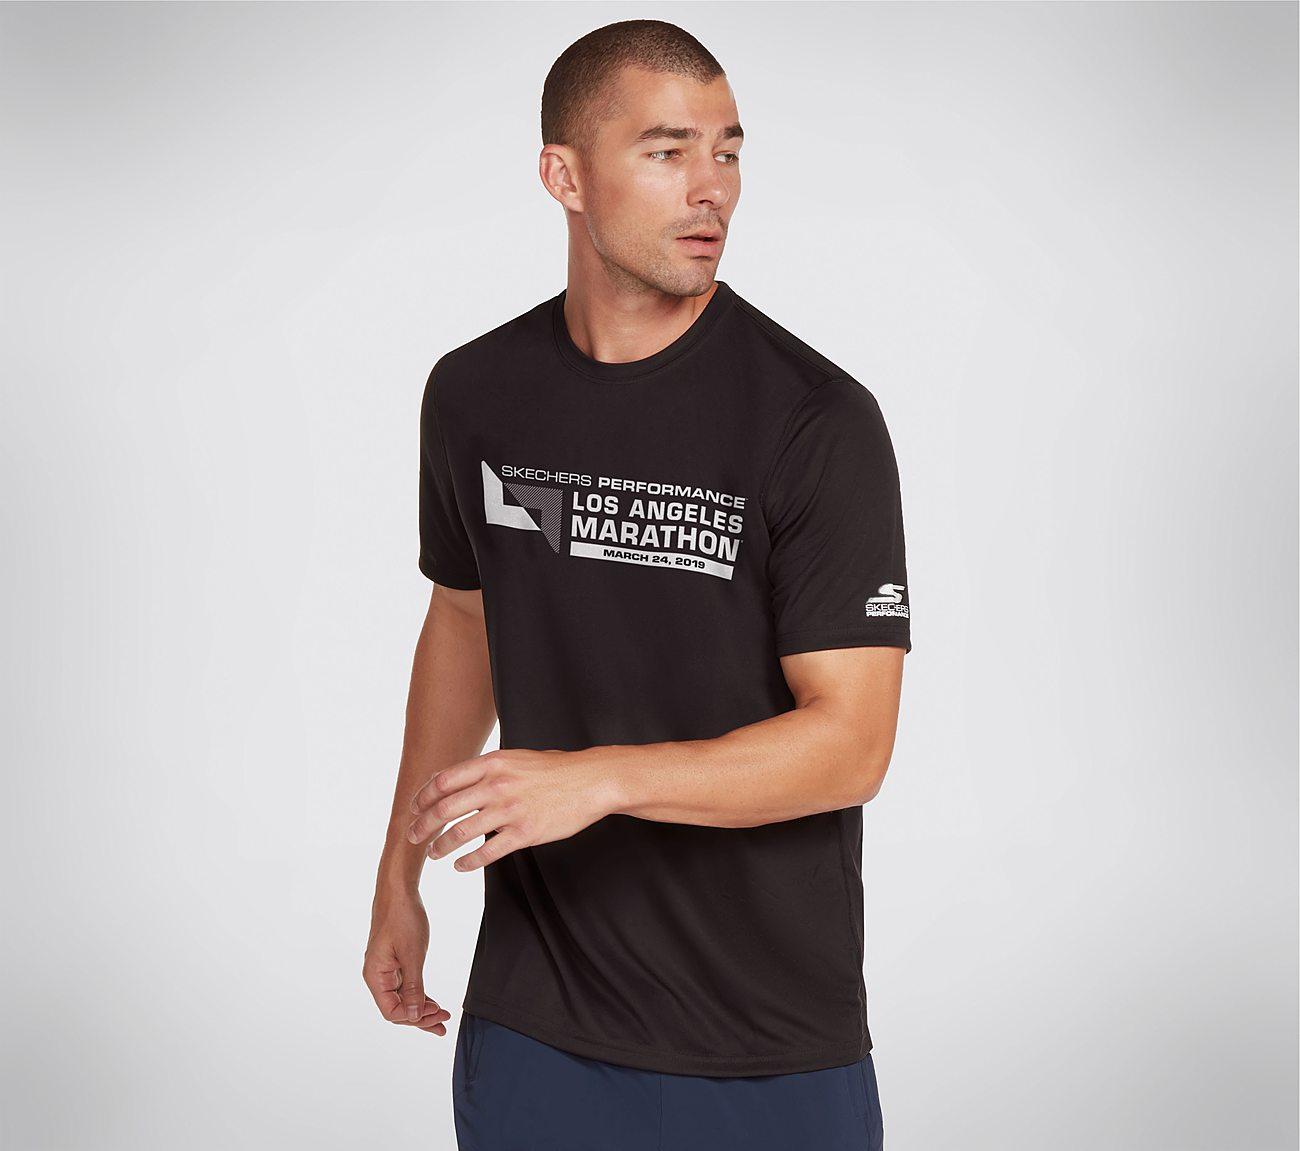 Skechers Performance Los Angeles Marathon Tech Tee Shirt